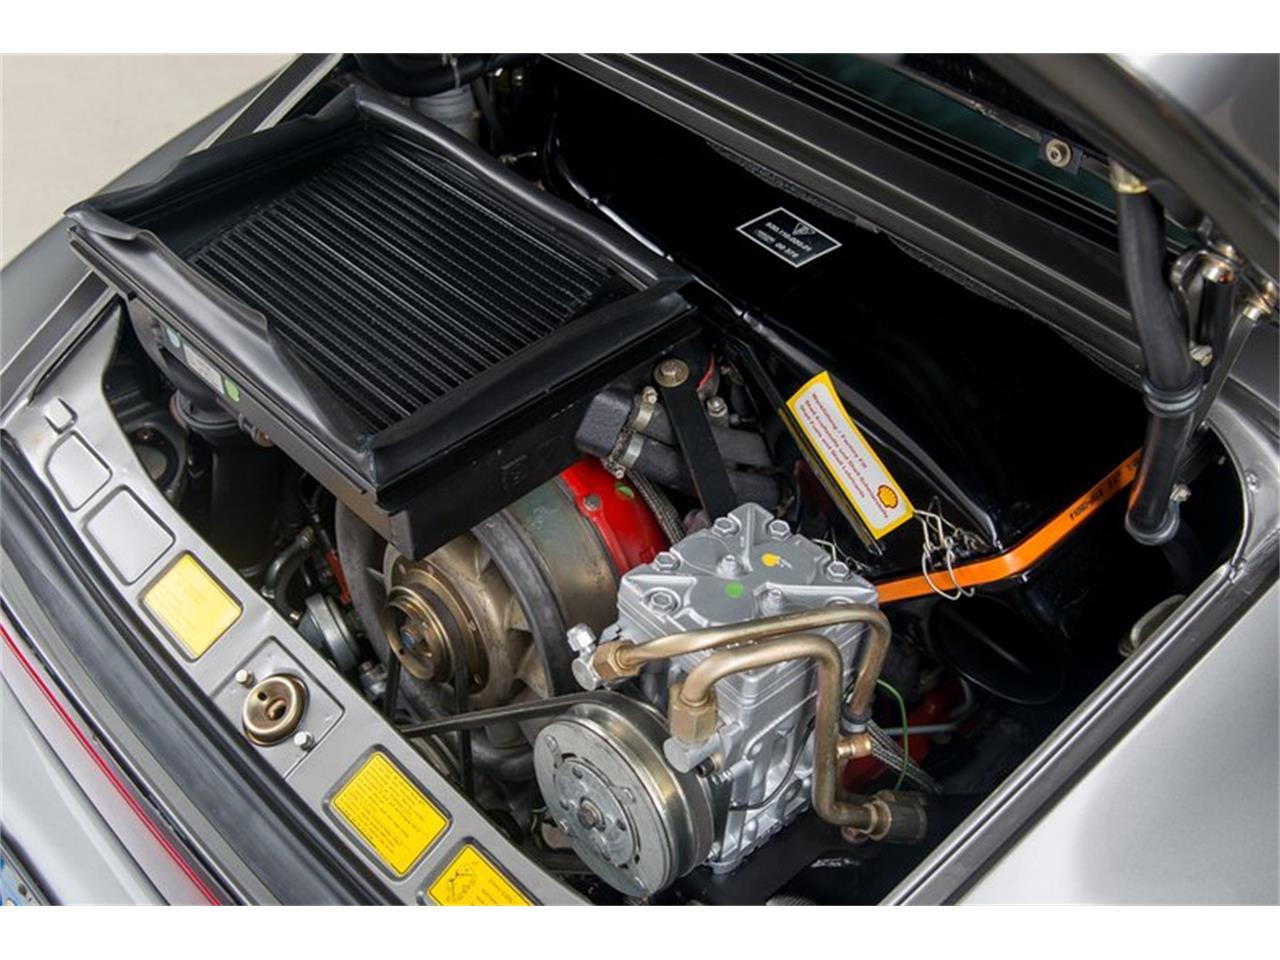 1979 Porsche 930 Turbo (CC-1193365) for sale in Scotts Valley, California